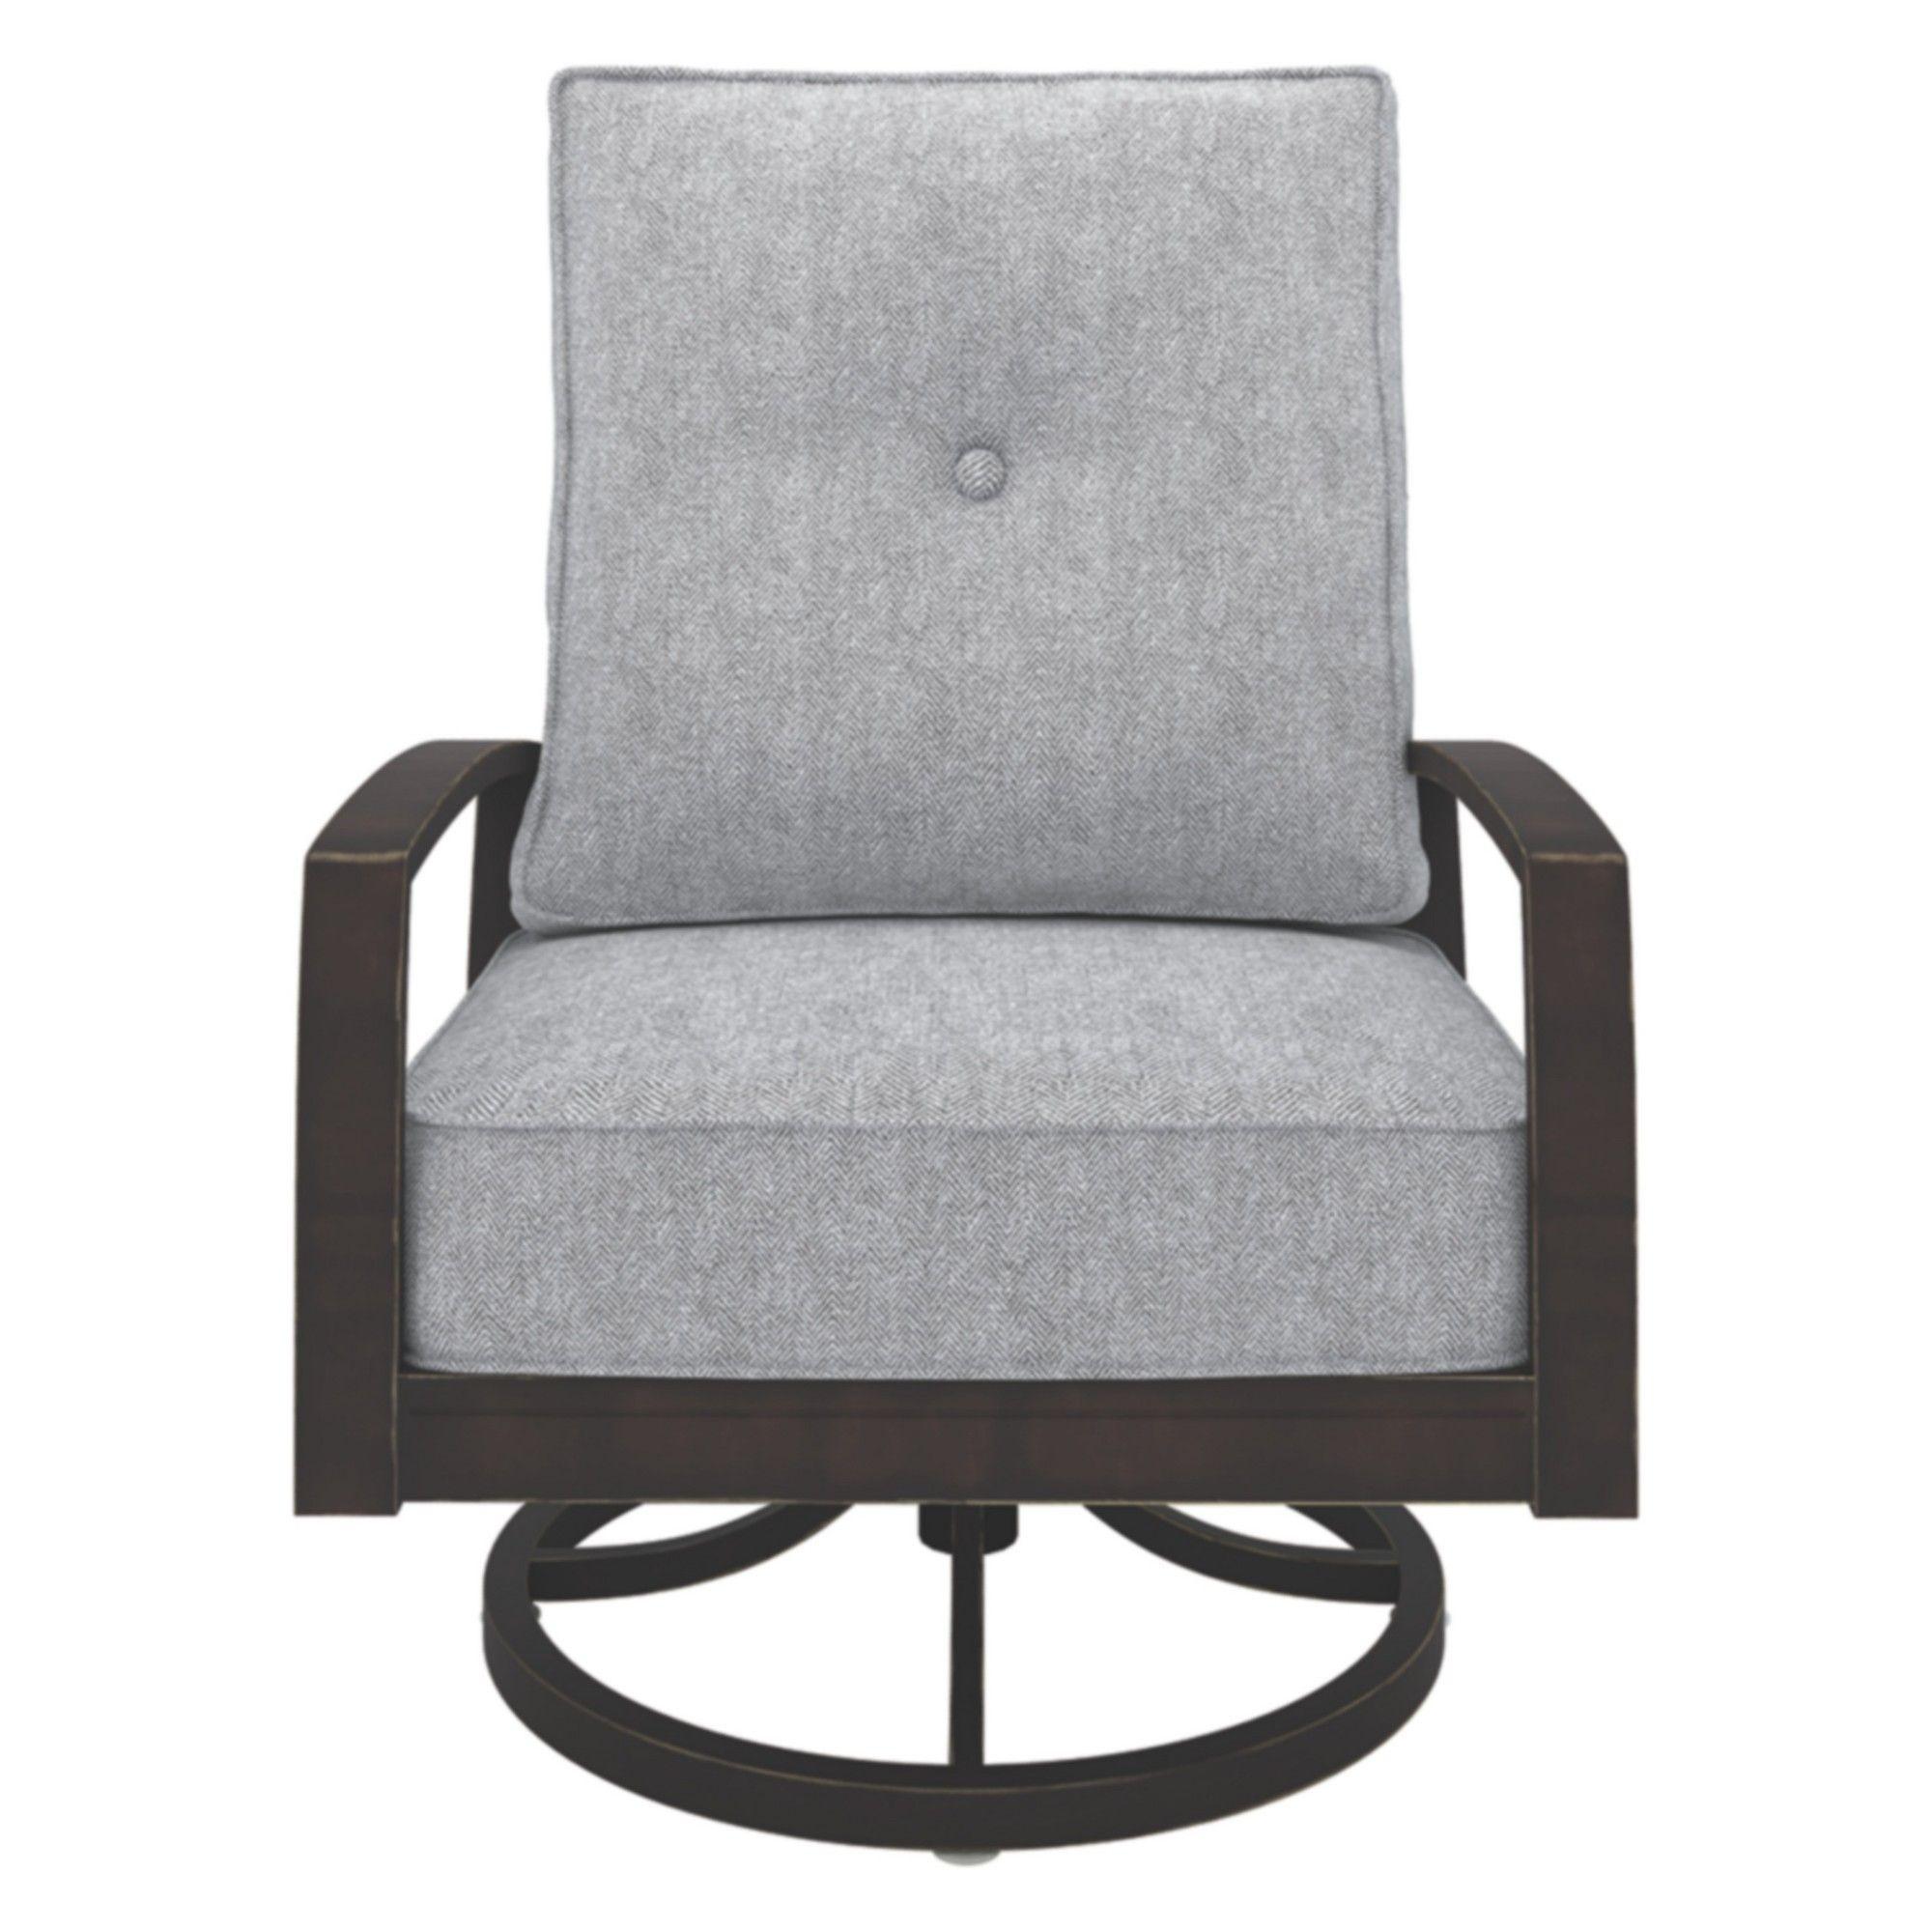 Castle island swivel lounge chair dark brown outdoor